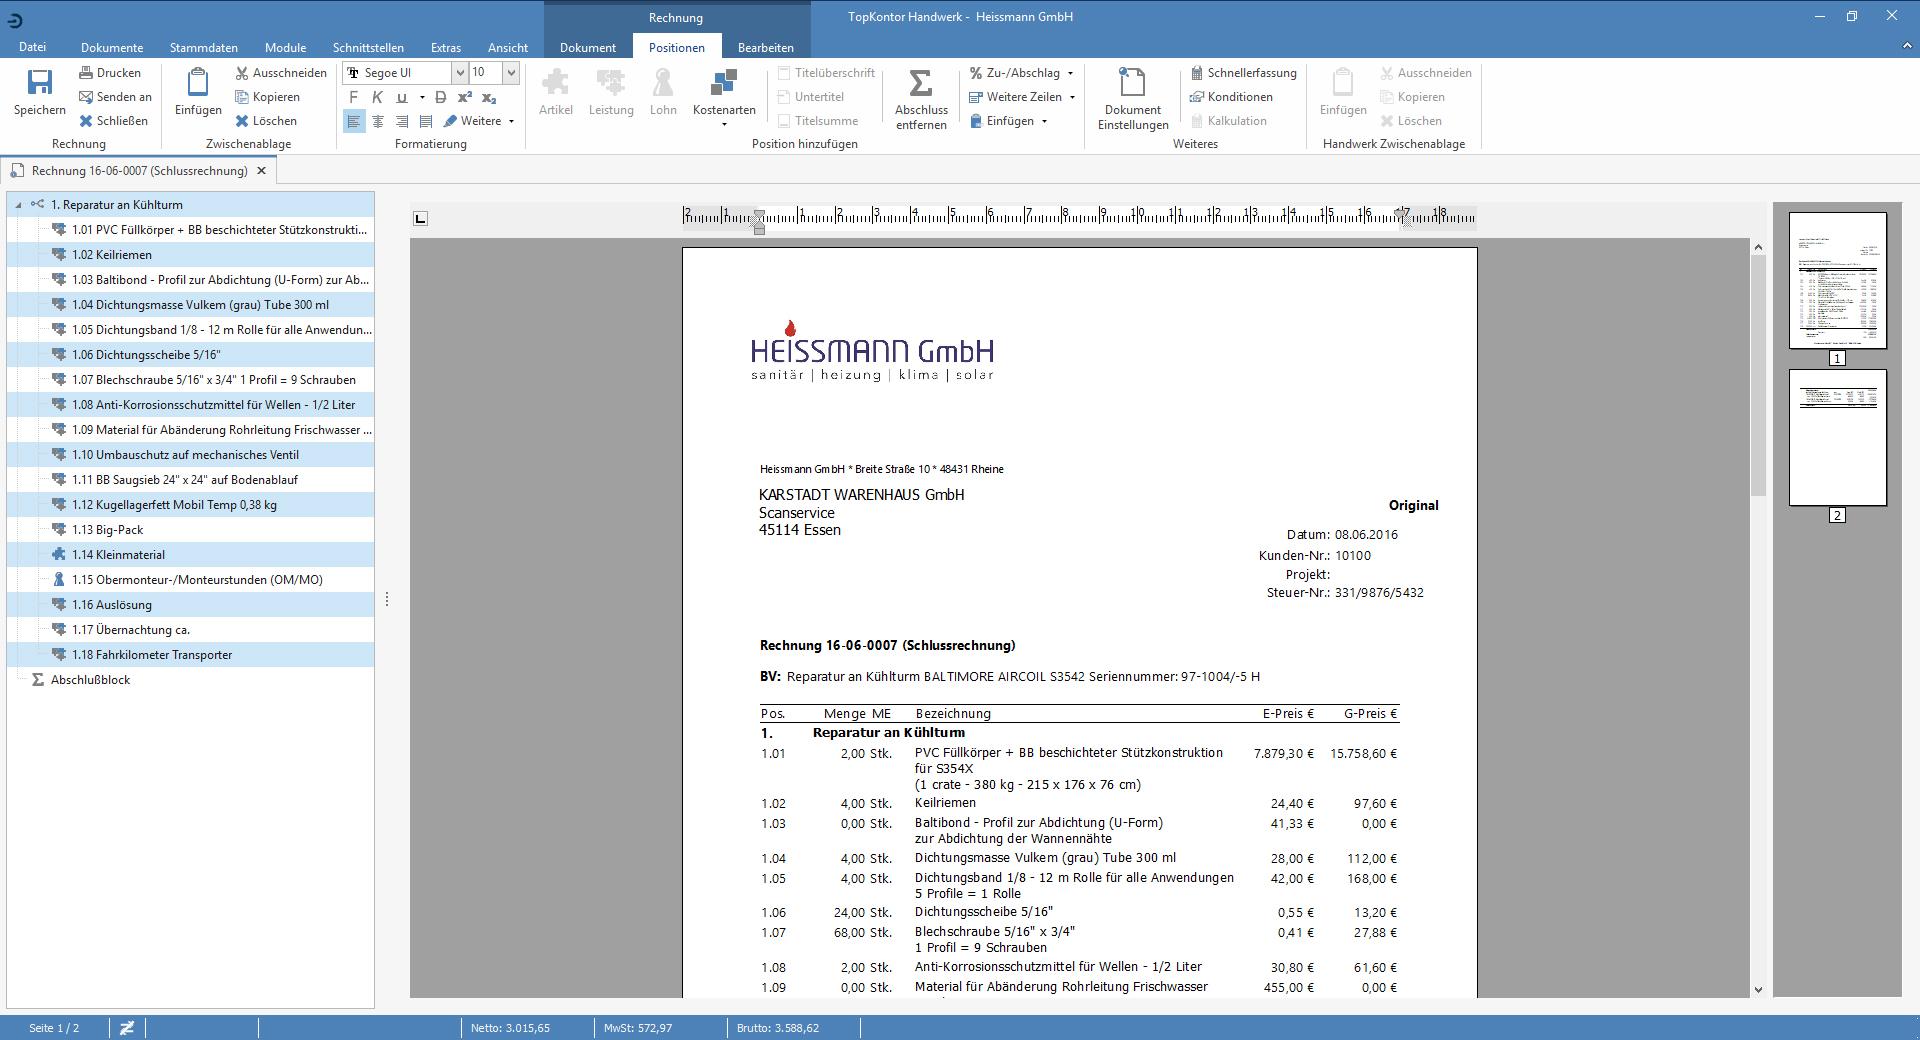 TopKontor Handwerk V6 - Rechnung